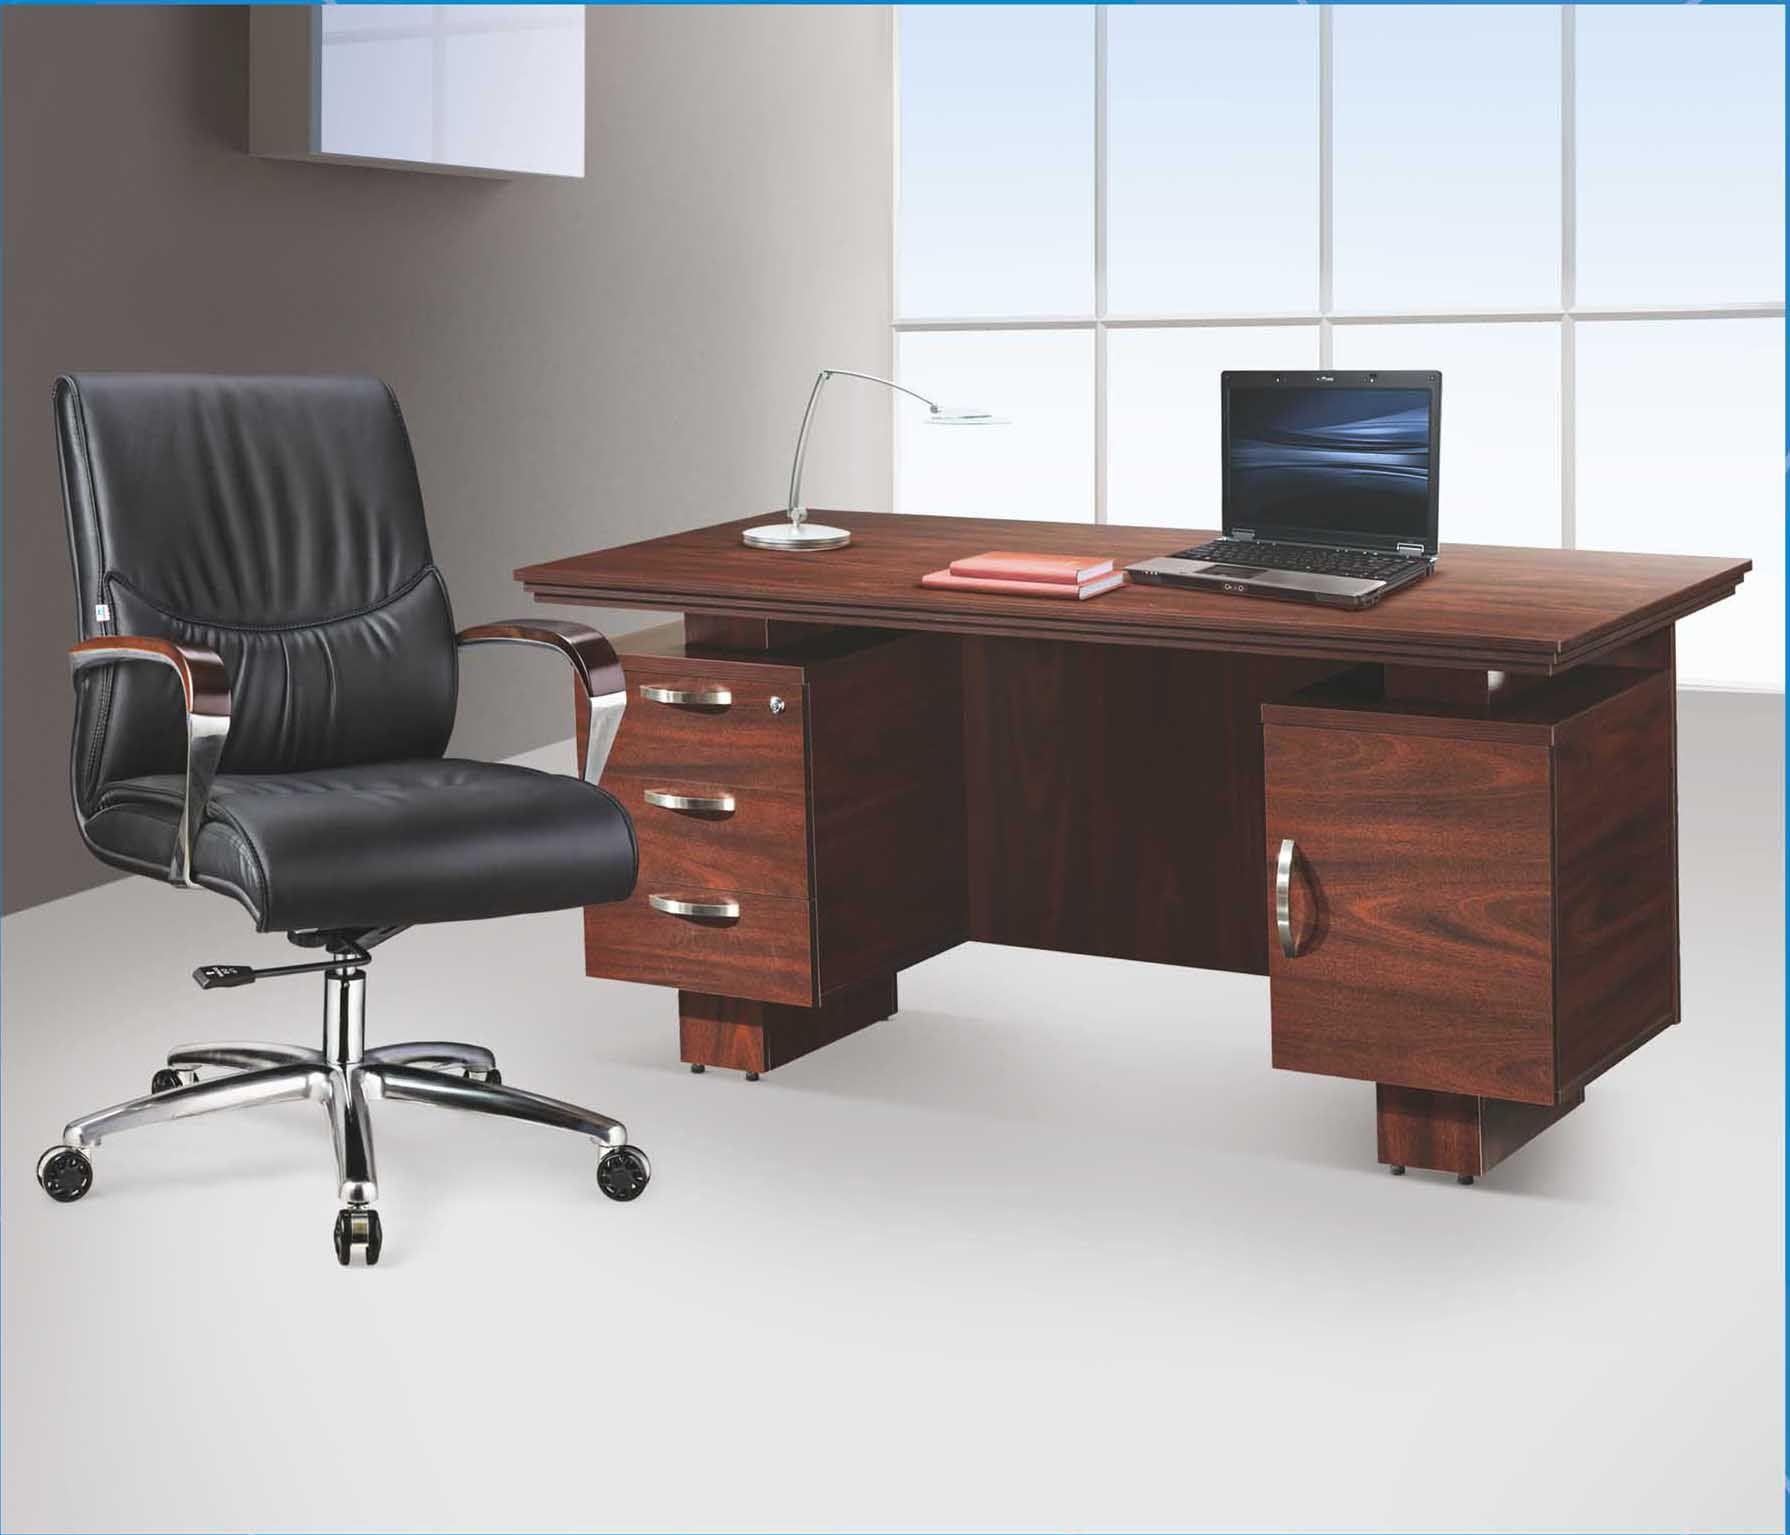 Buy Modular Office Furniture Online Best home office